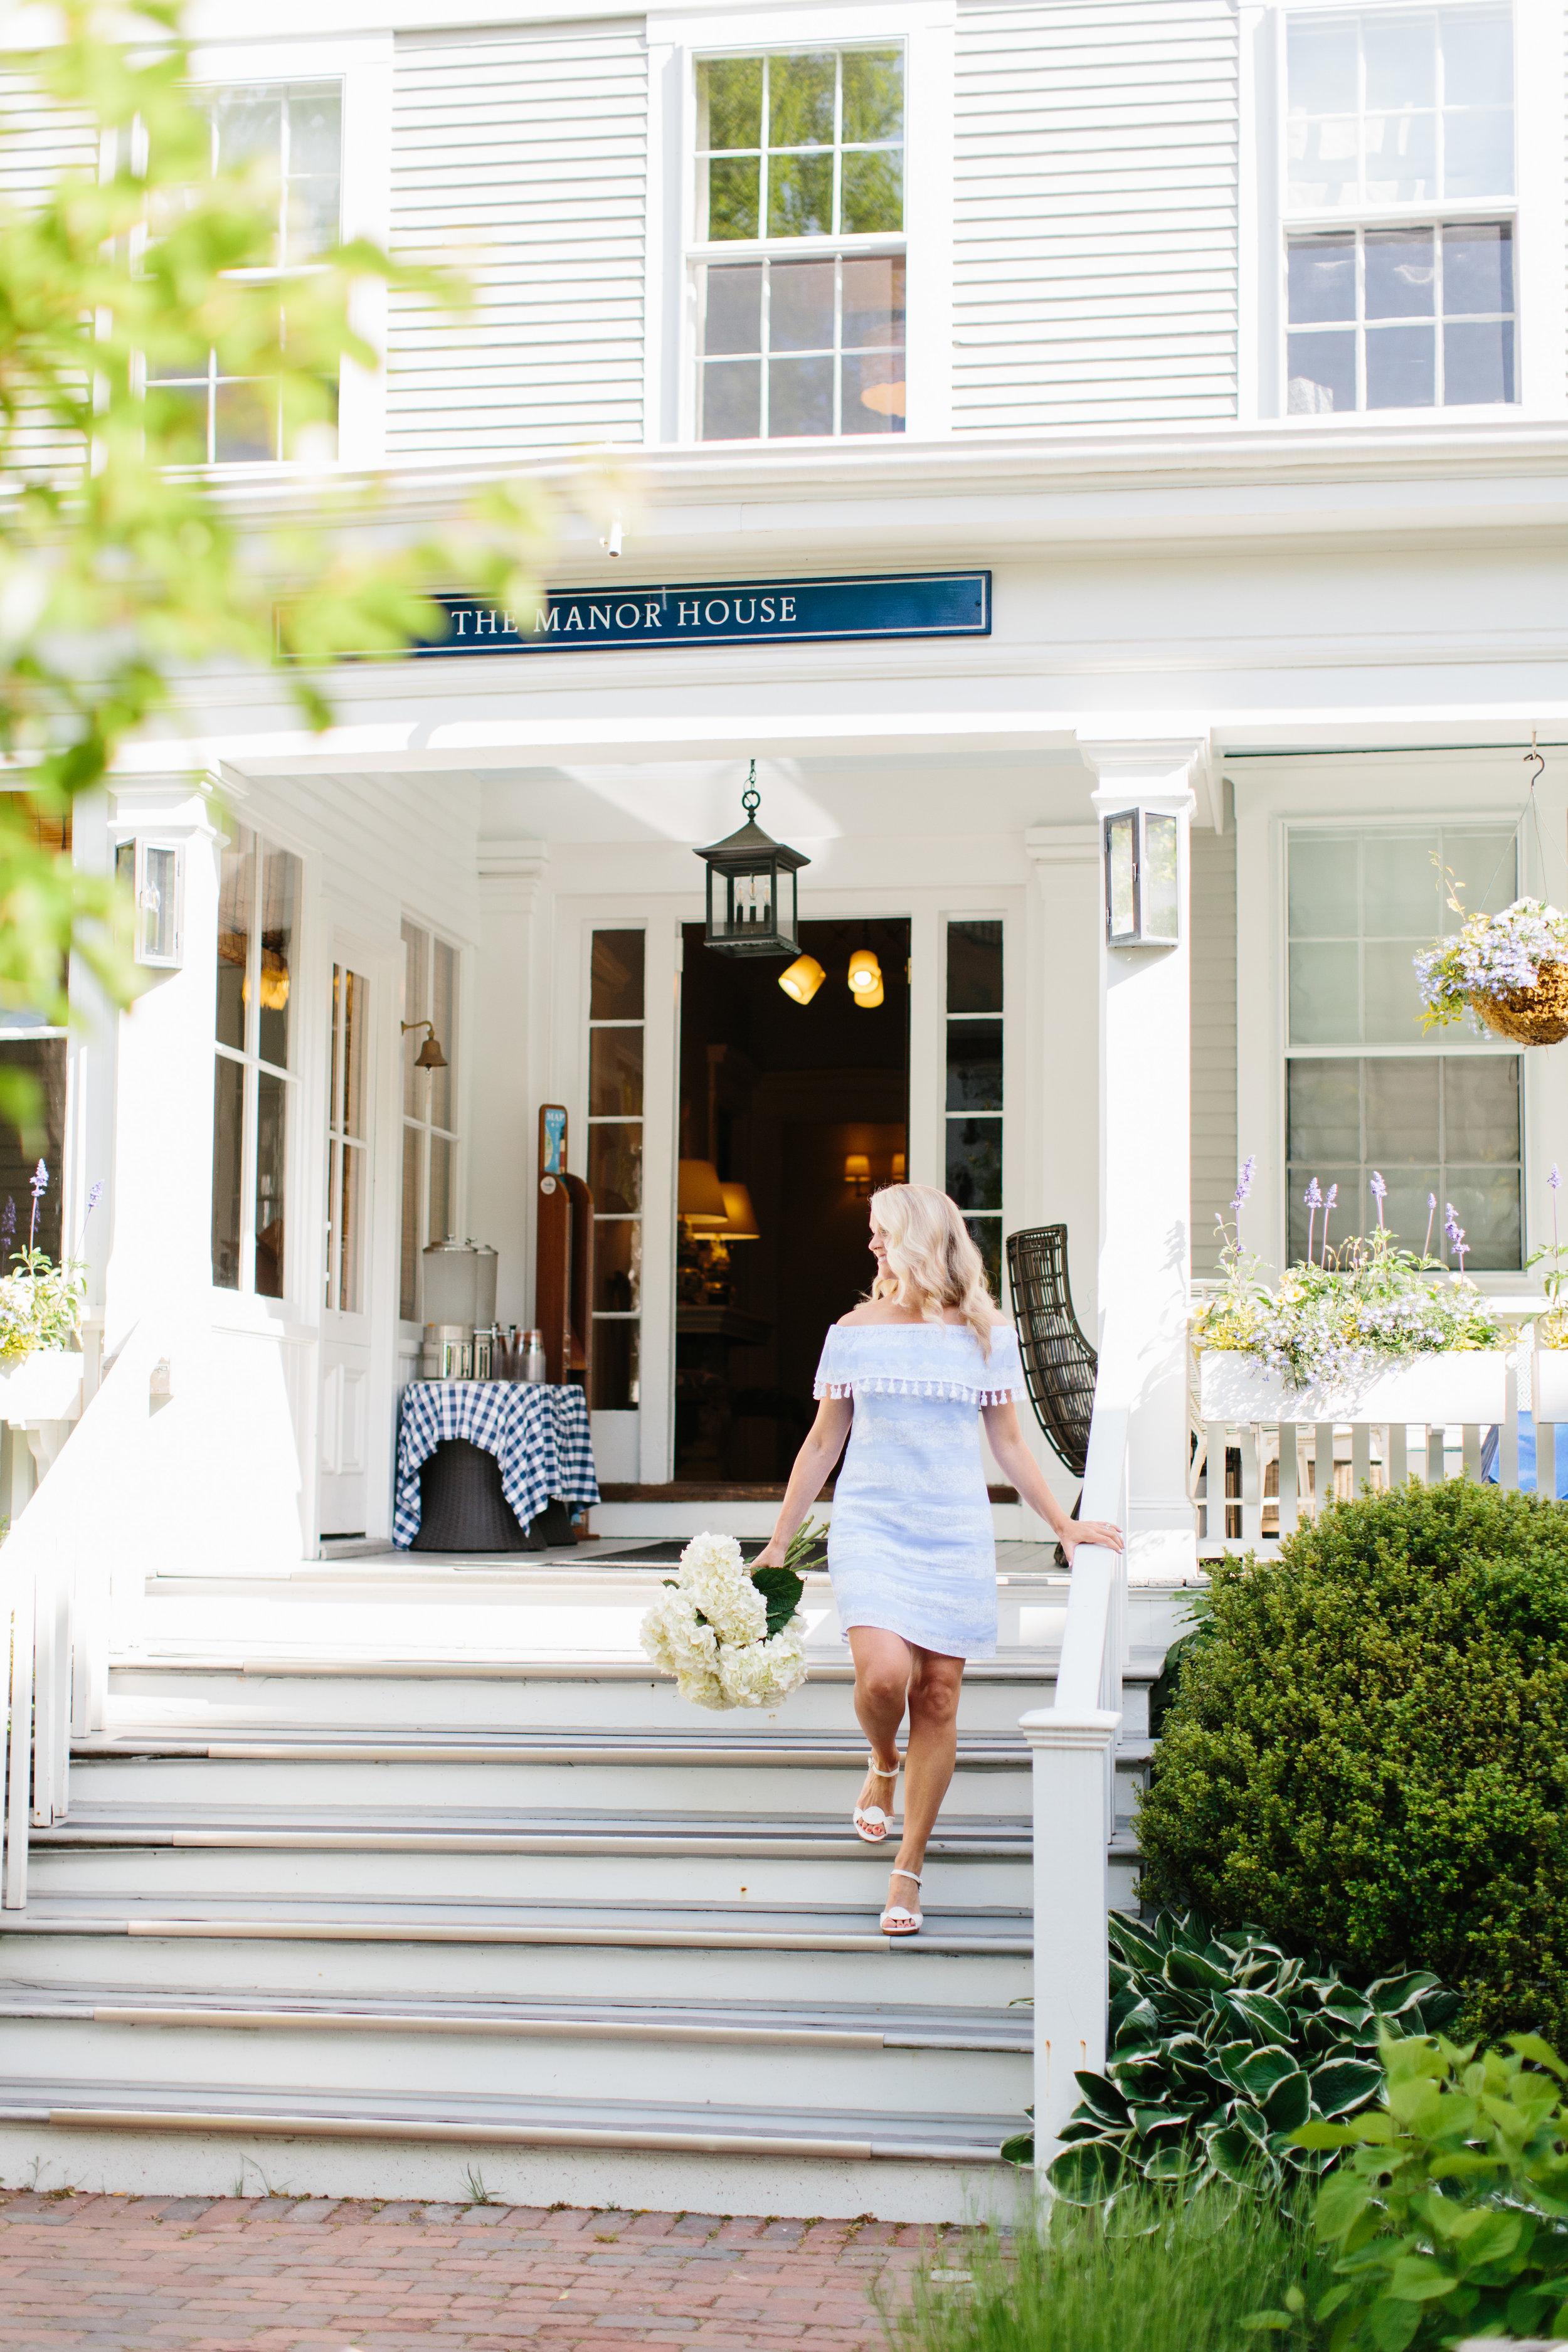 Nantucket Hotels New England Summer Attire Beach Outfits Abby Capalbo   Photography: Erin McGinn